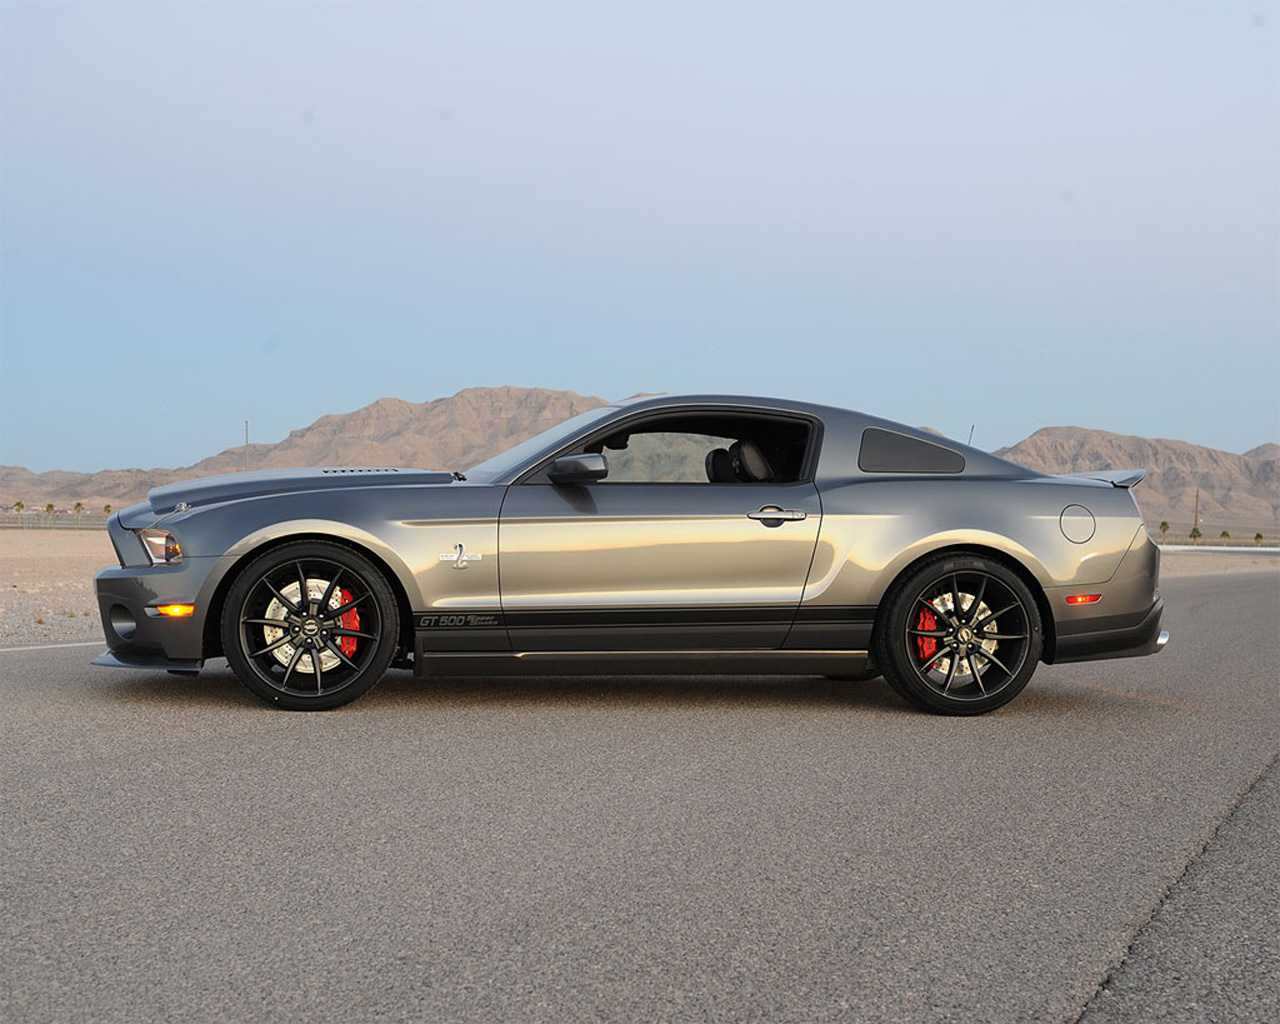 Mustang Shelby GT500 Super Snake